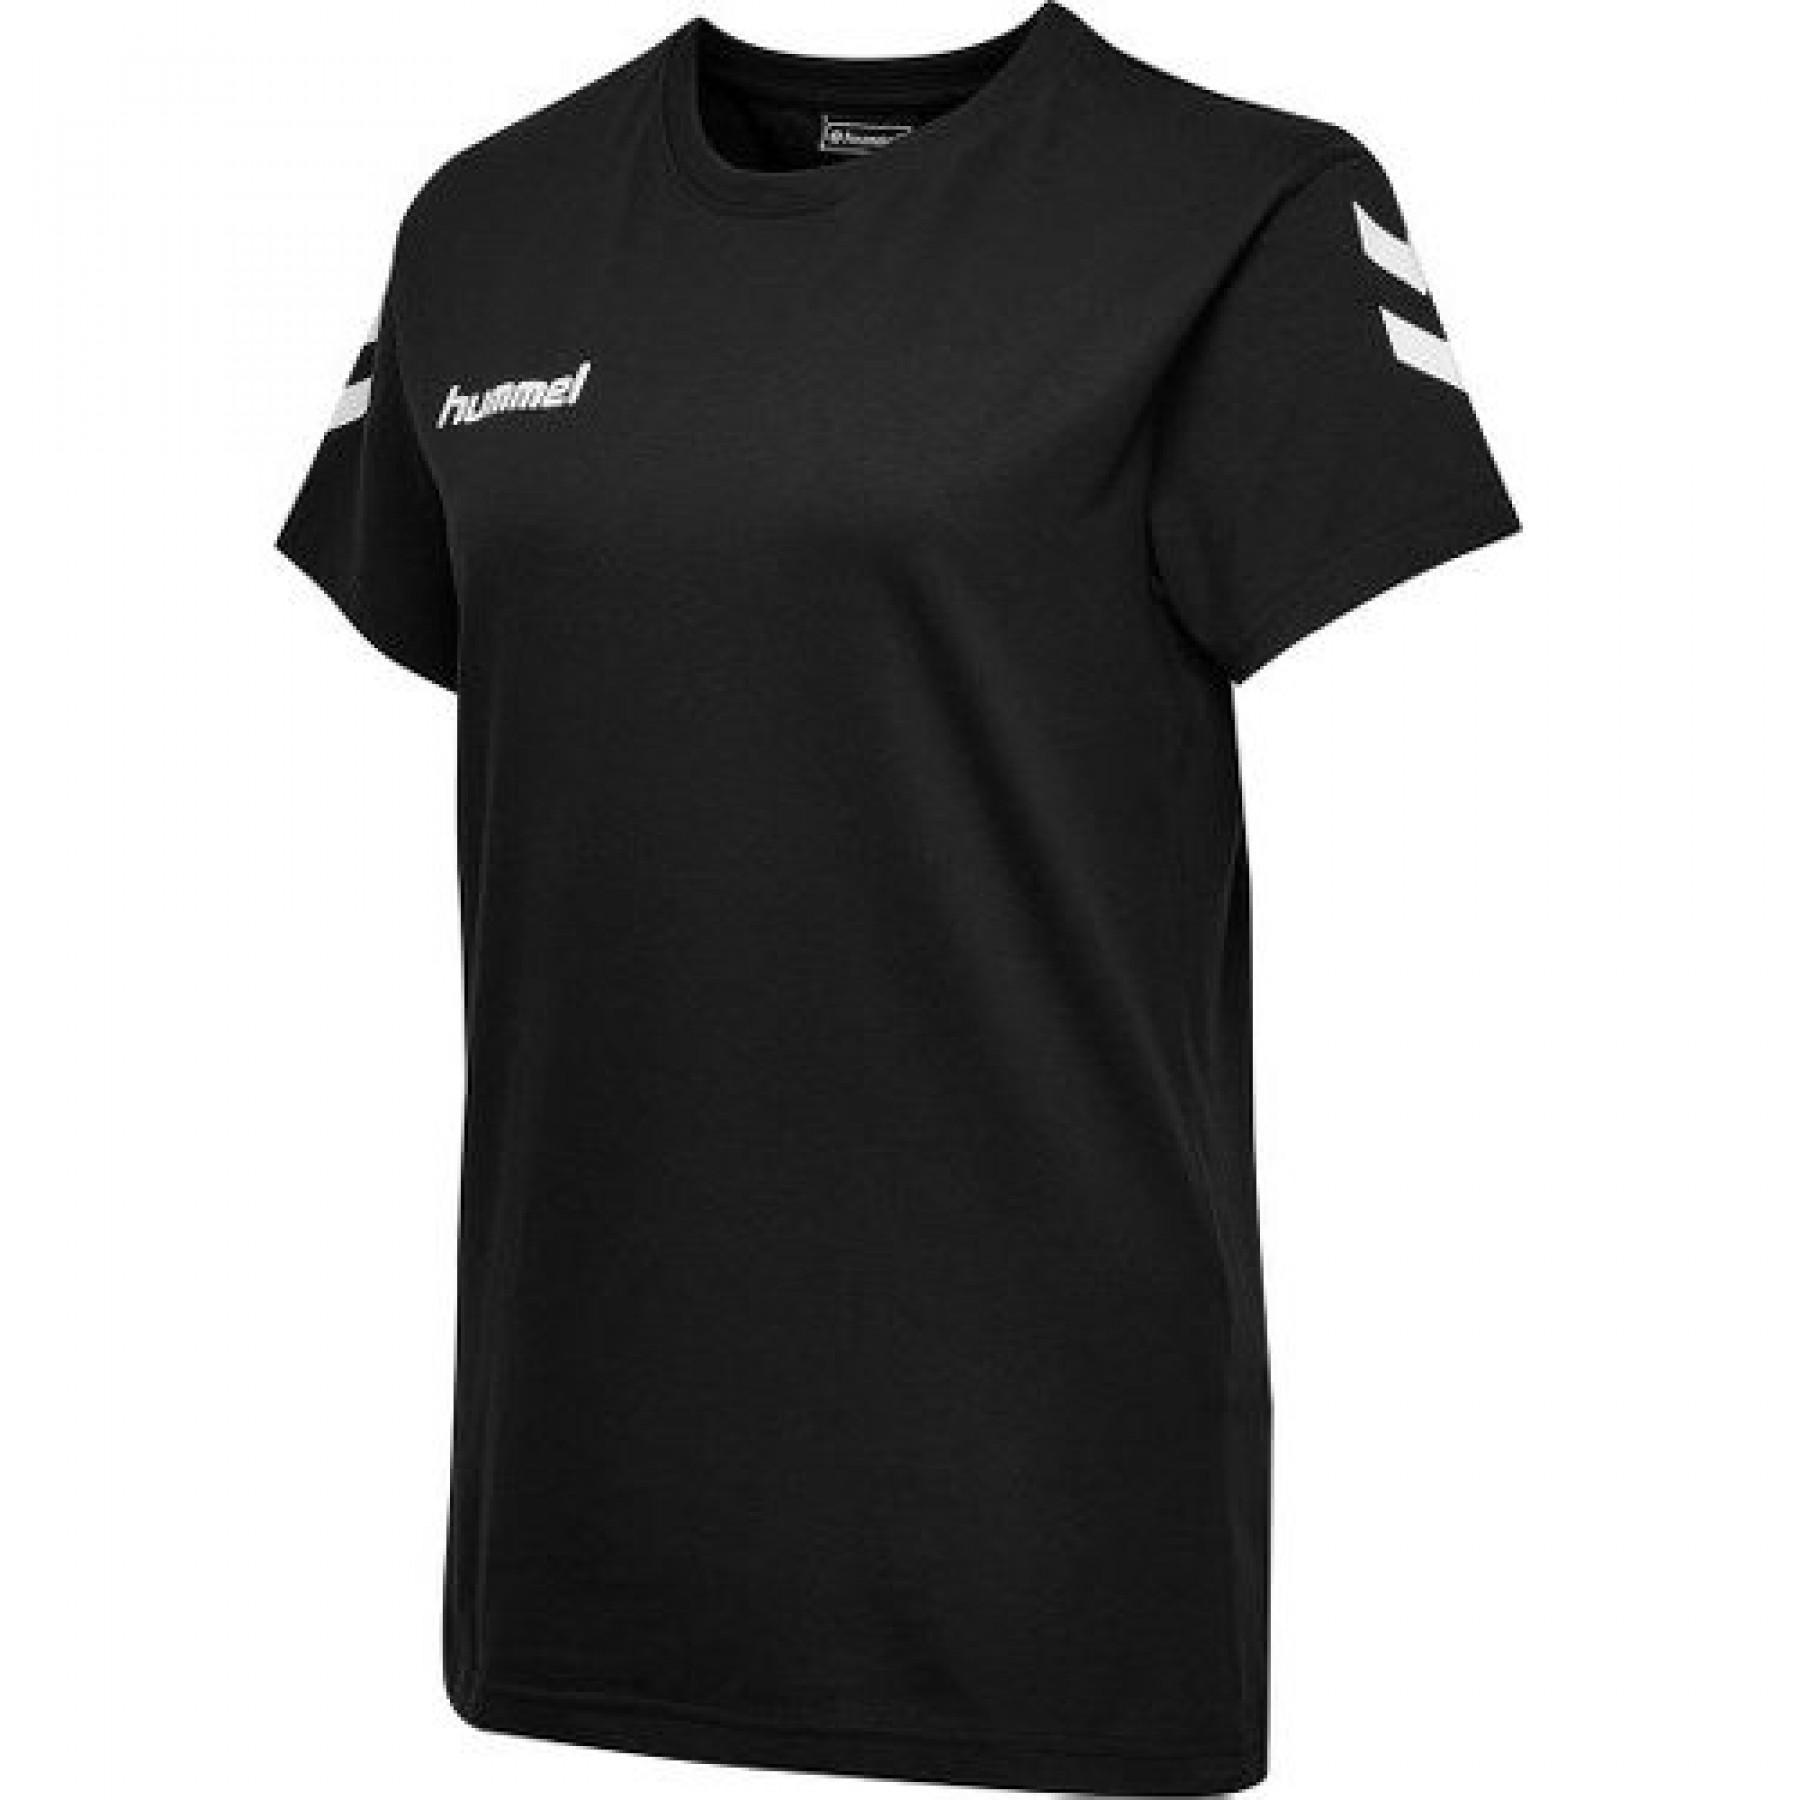 T-Shirt woman Hummel Hmlgo